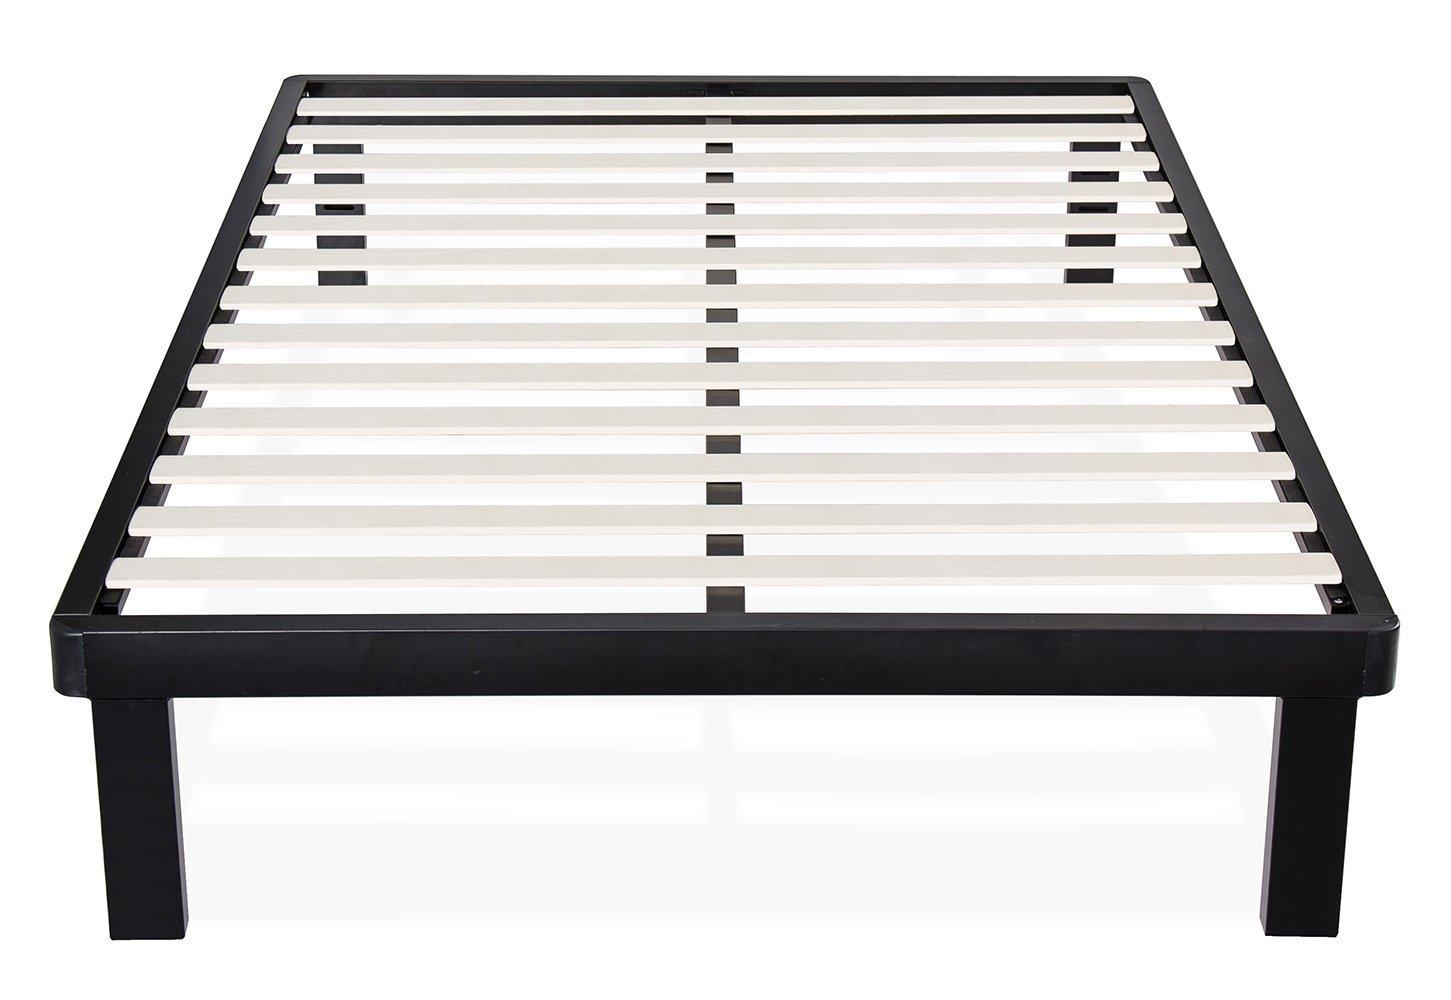 Olee Sleep 14 Inch Tall Dura Metal Wood Slat Bed Frame Matress Foundation 14BF03 (Twin)